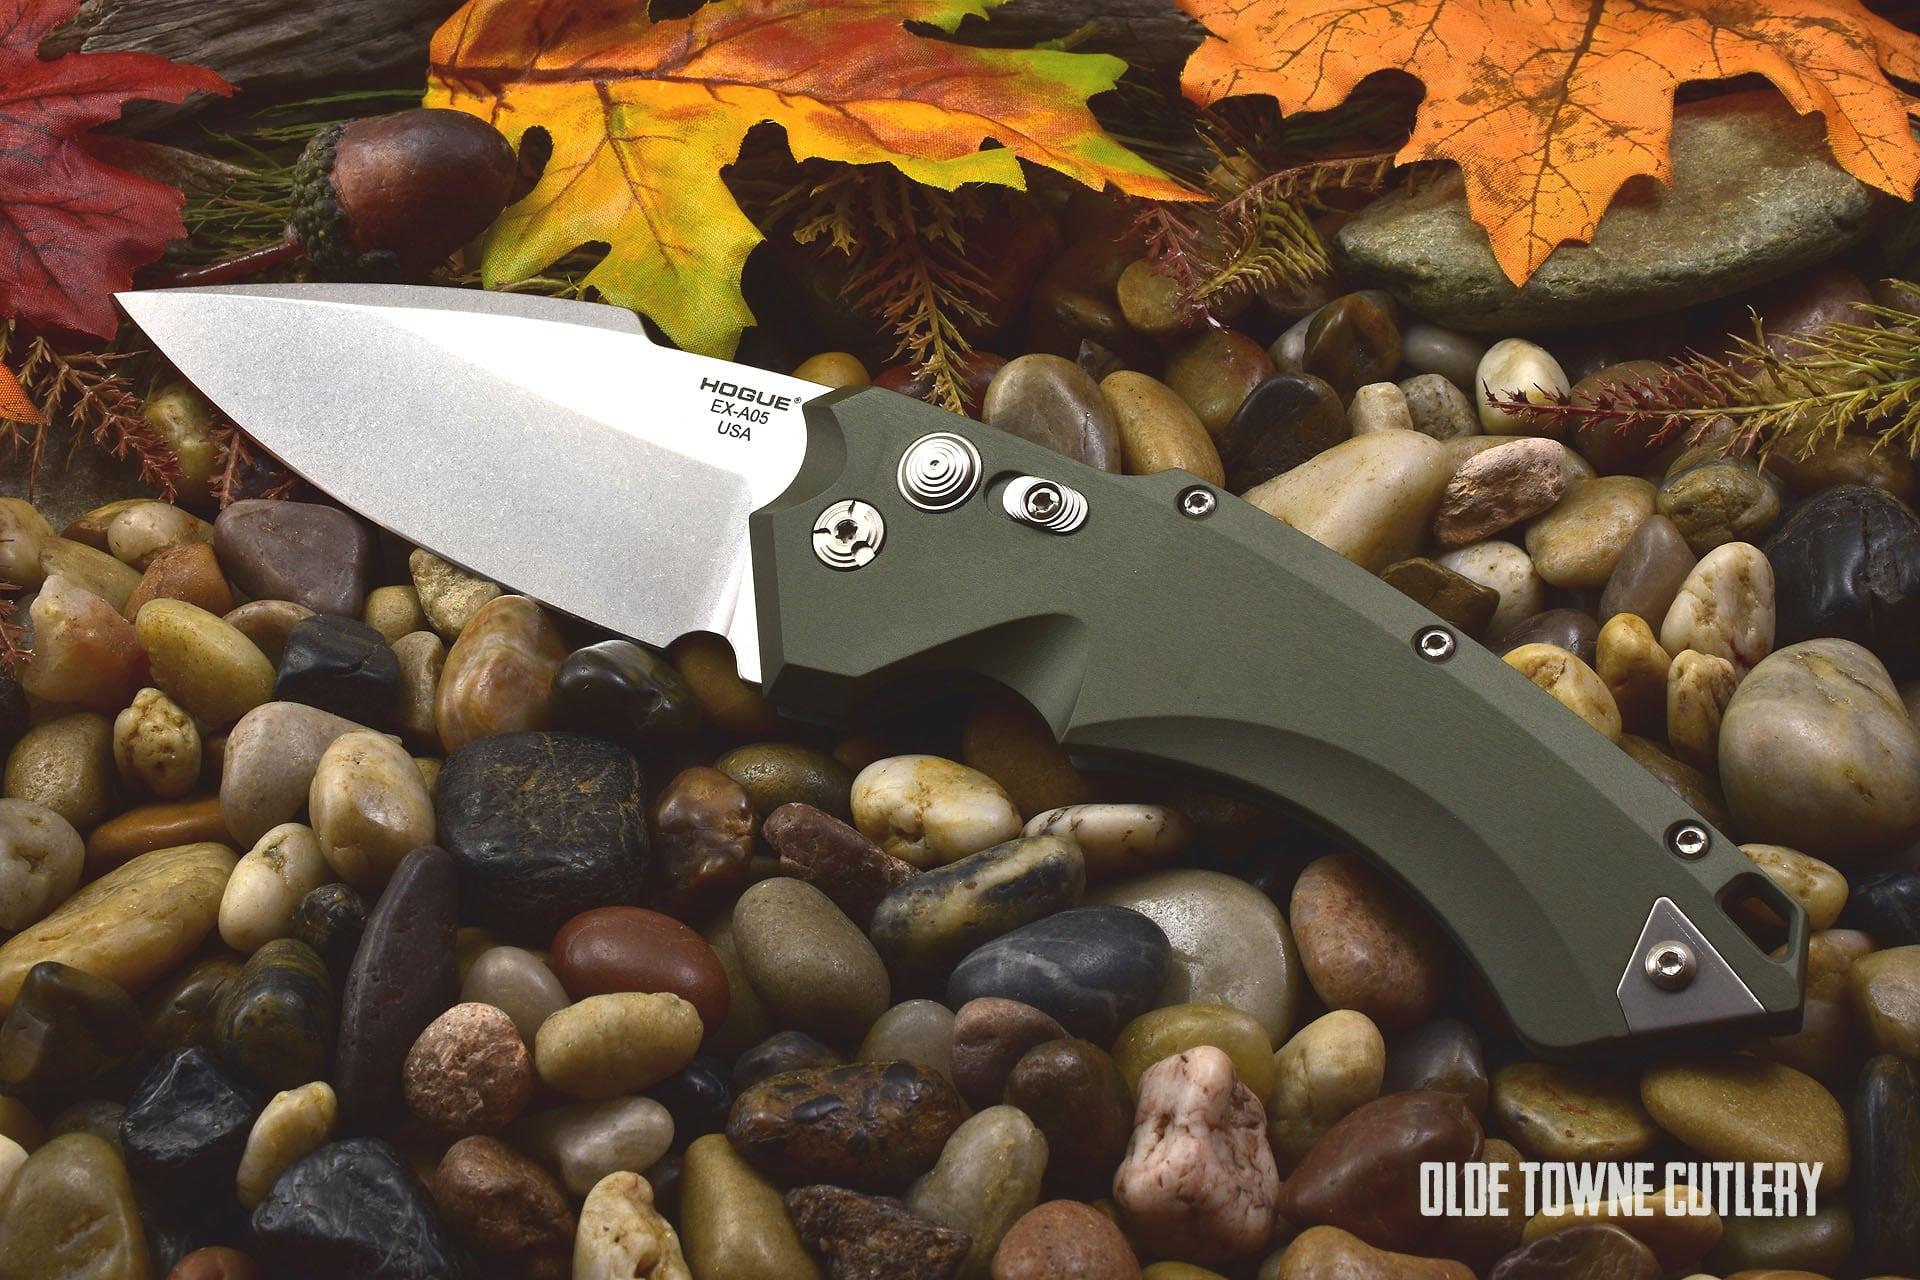 Hogue Knives 34511 EX-A05 OD Green